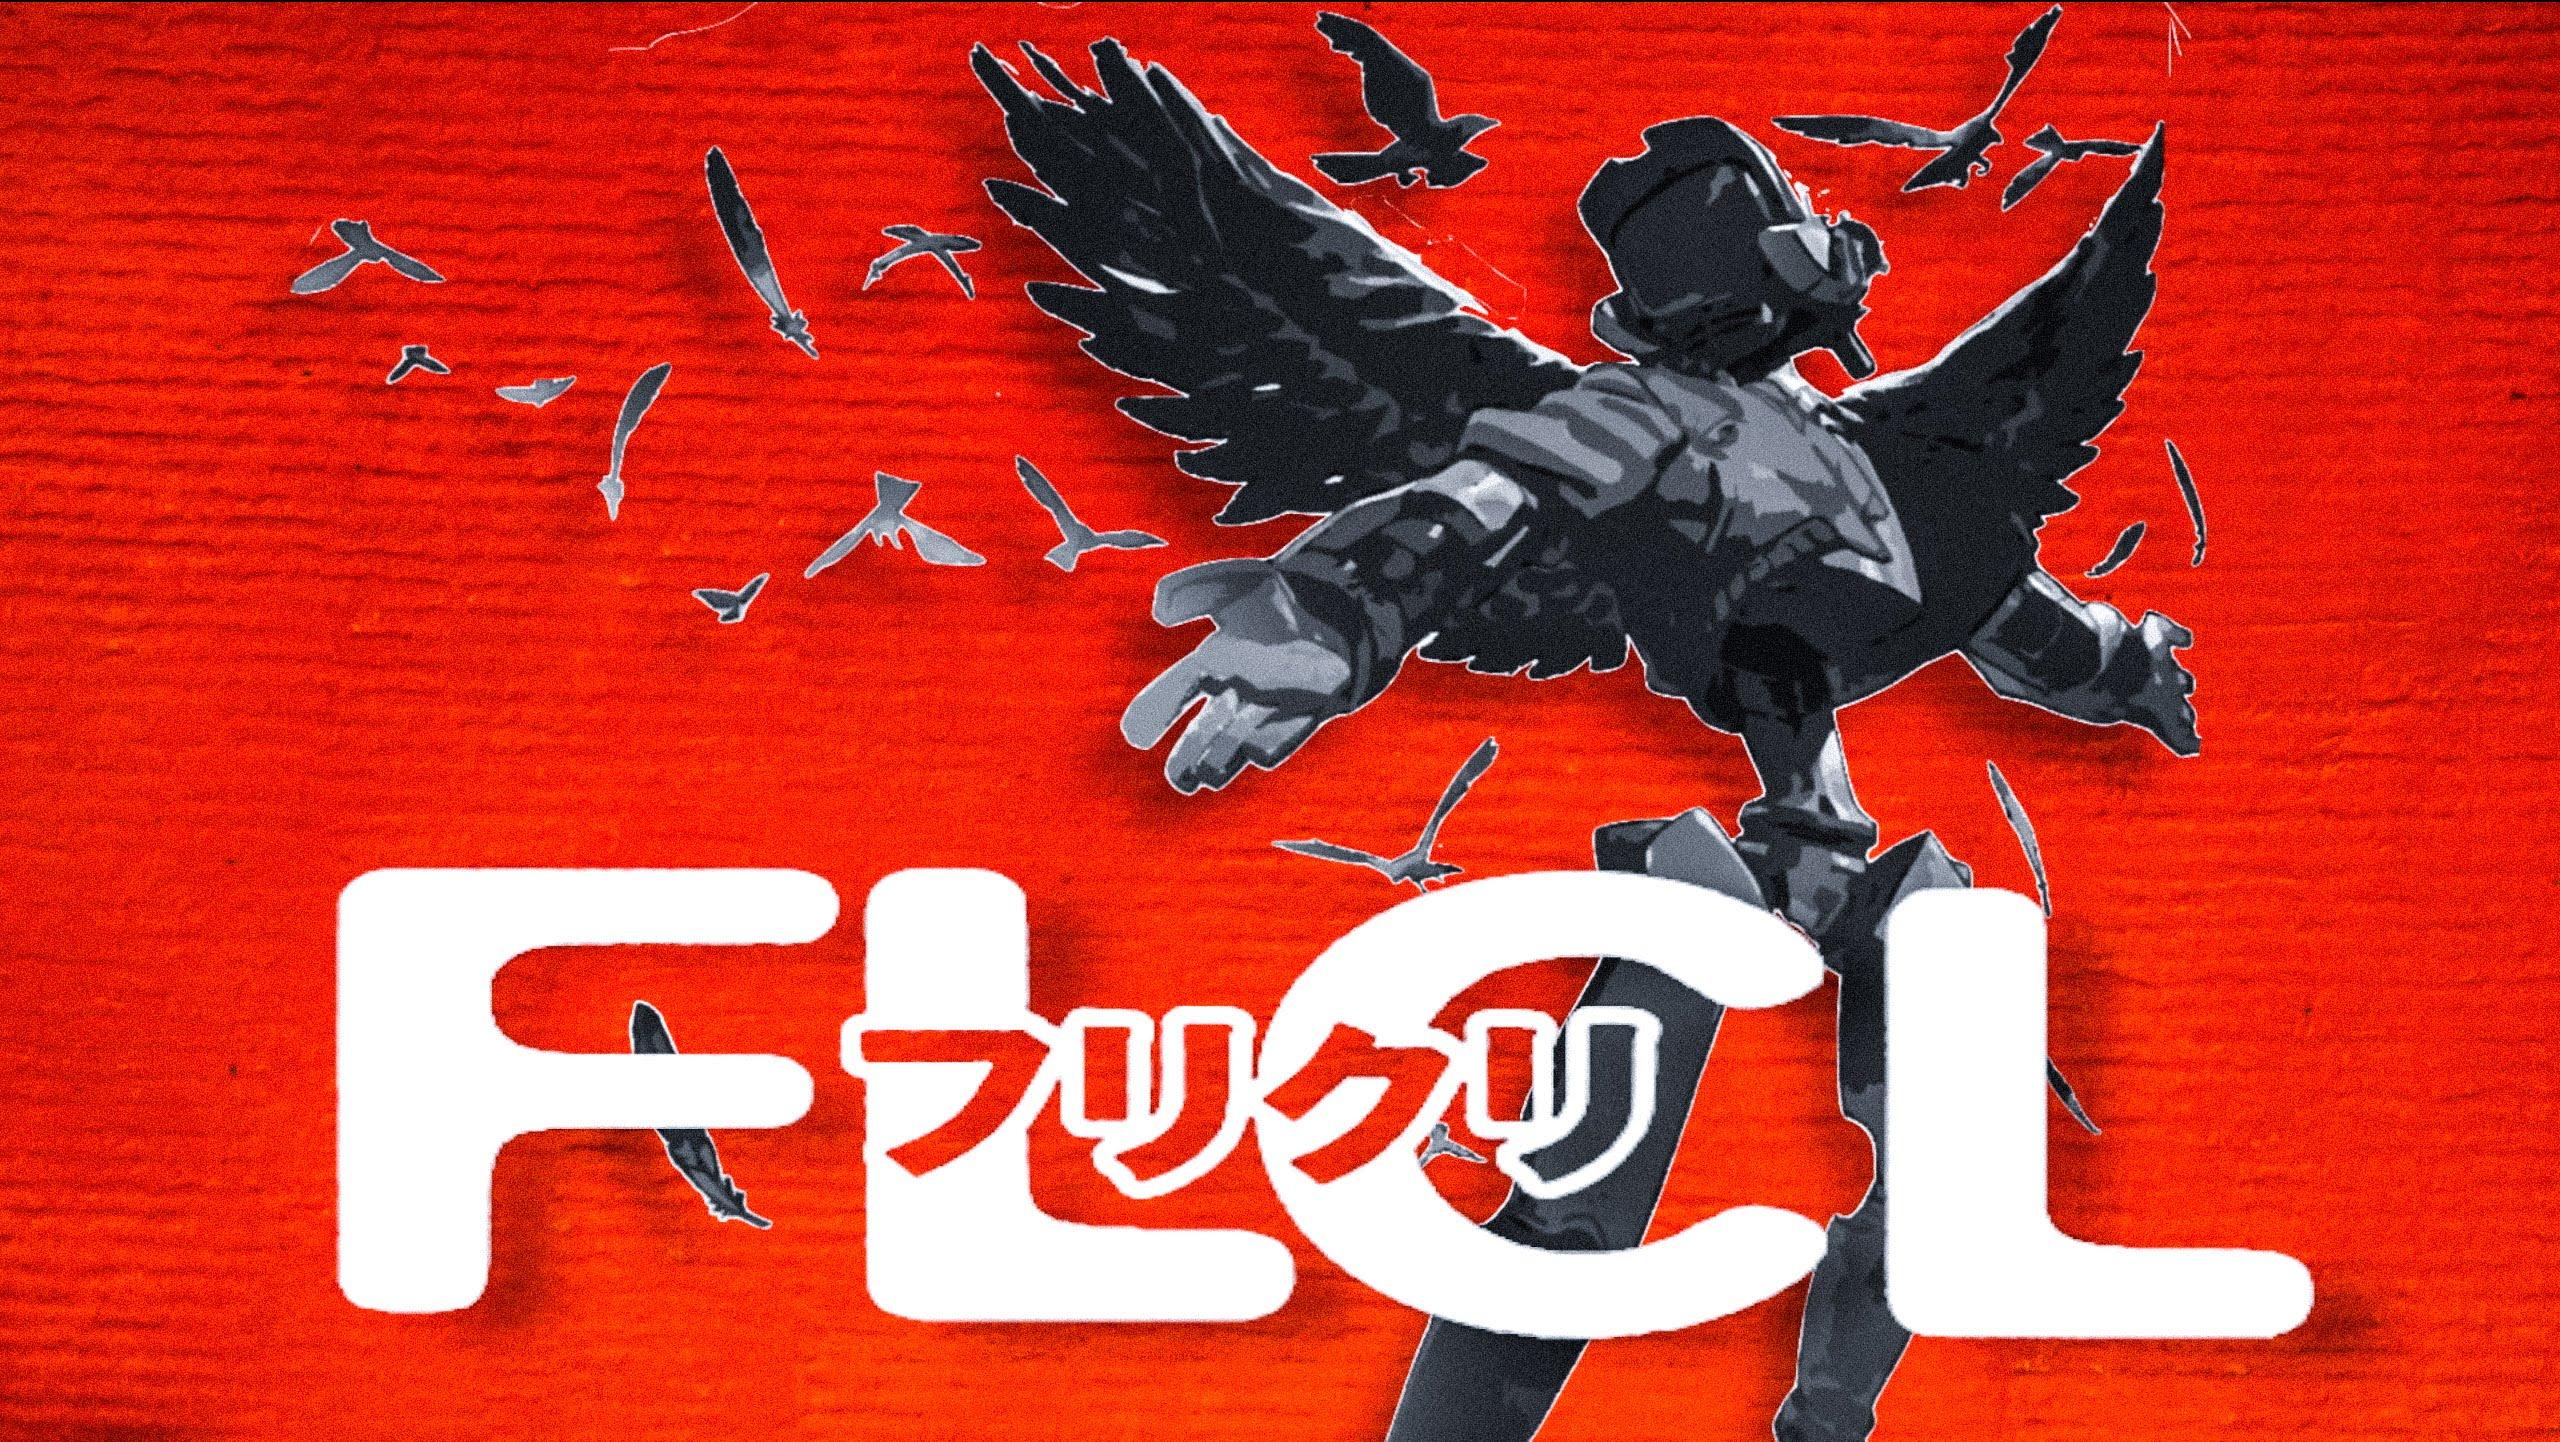 "Ein Video-Essay über die kurze Anime-Serie ""FLCL"" (Fooly Cooly)"